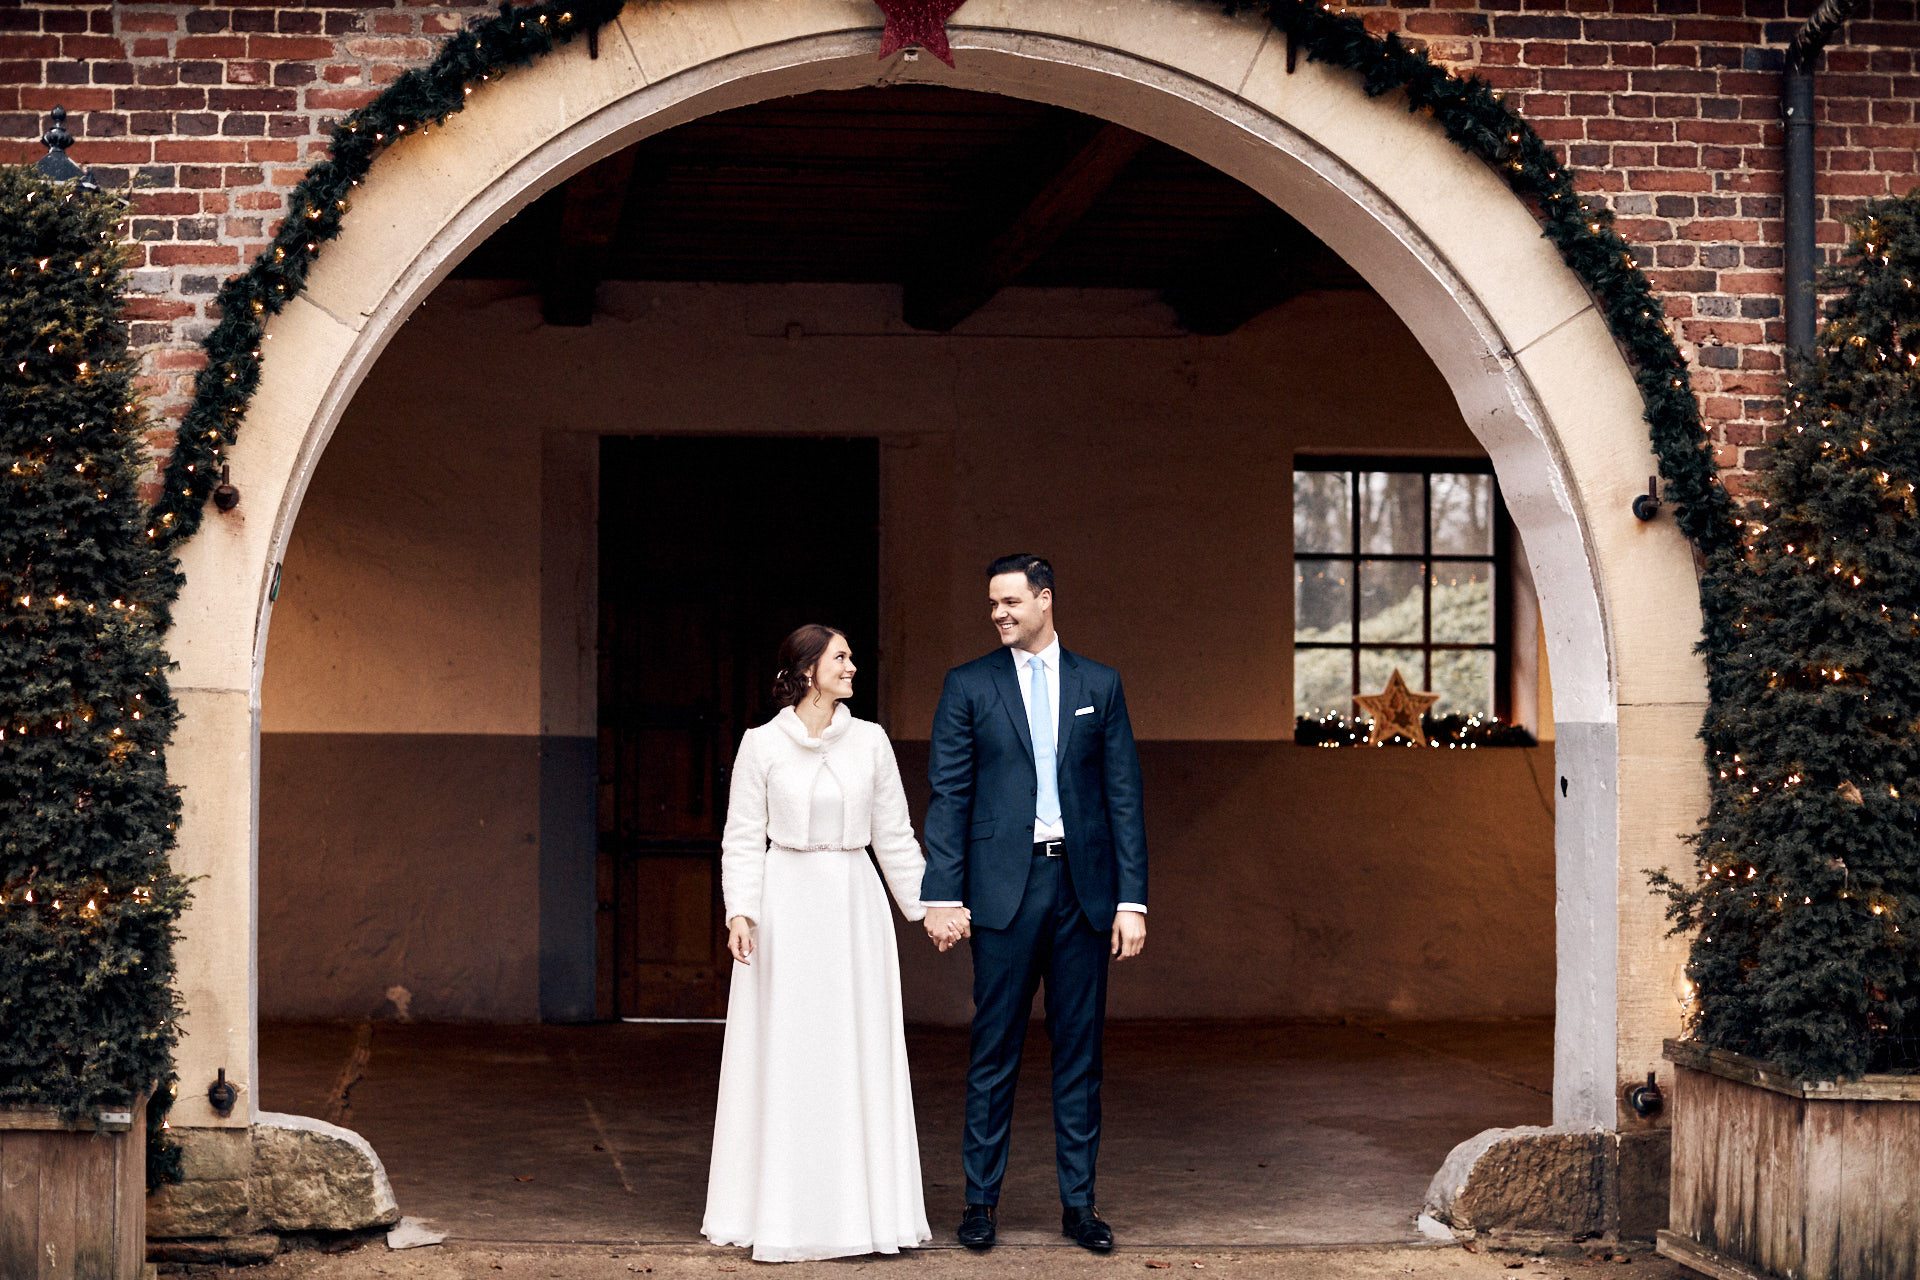 2019-12-20 Laura & Robin - Alena and Daniel Weddings 0458 2